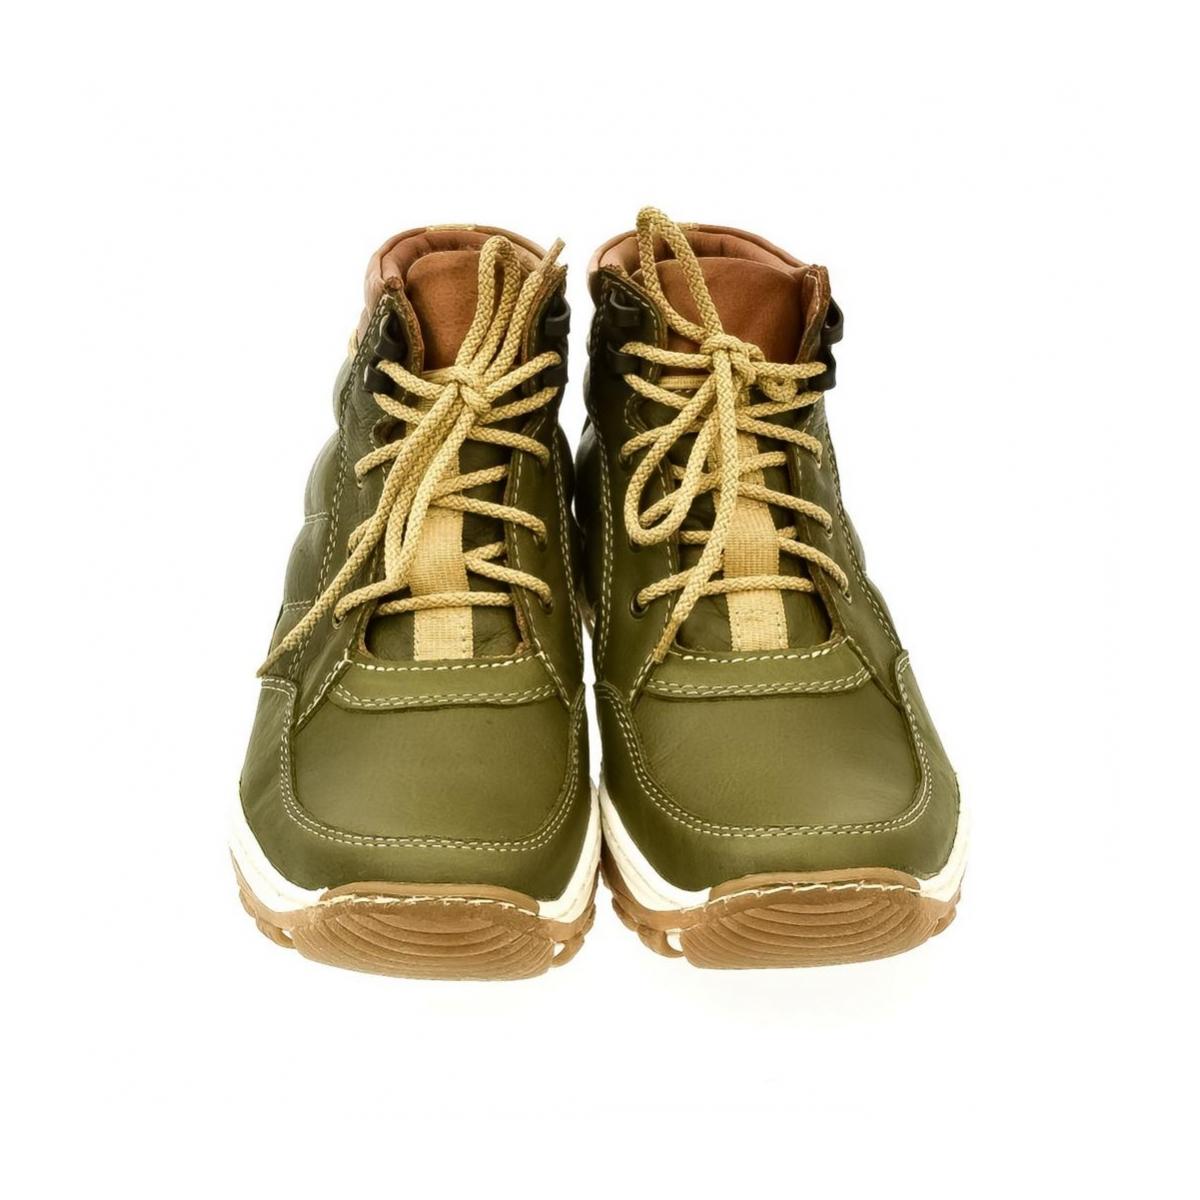 Dámske zelené kožené topánky CANA - 2 66c5733feec